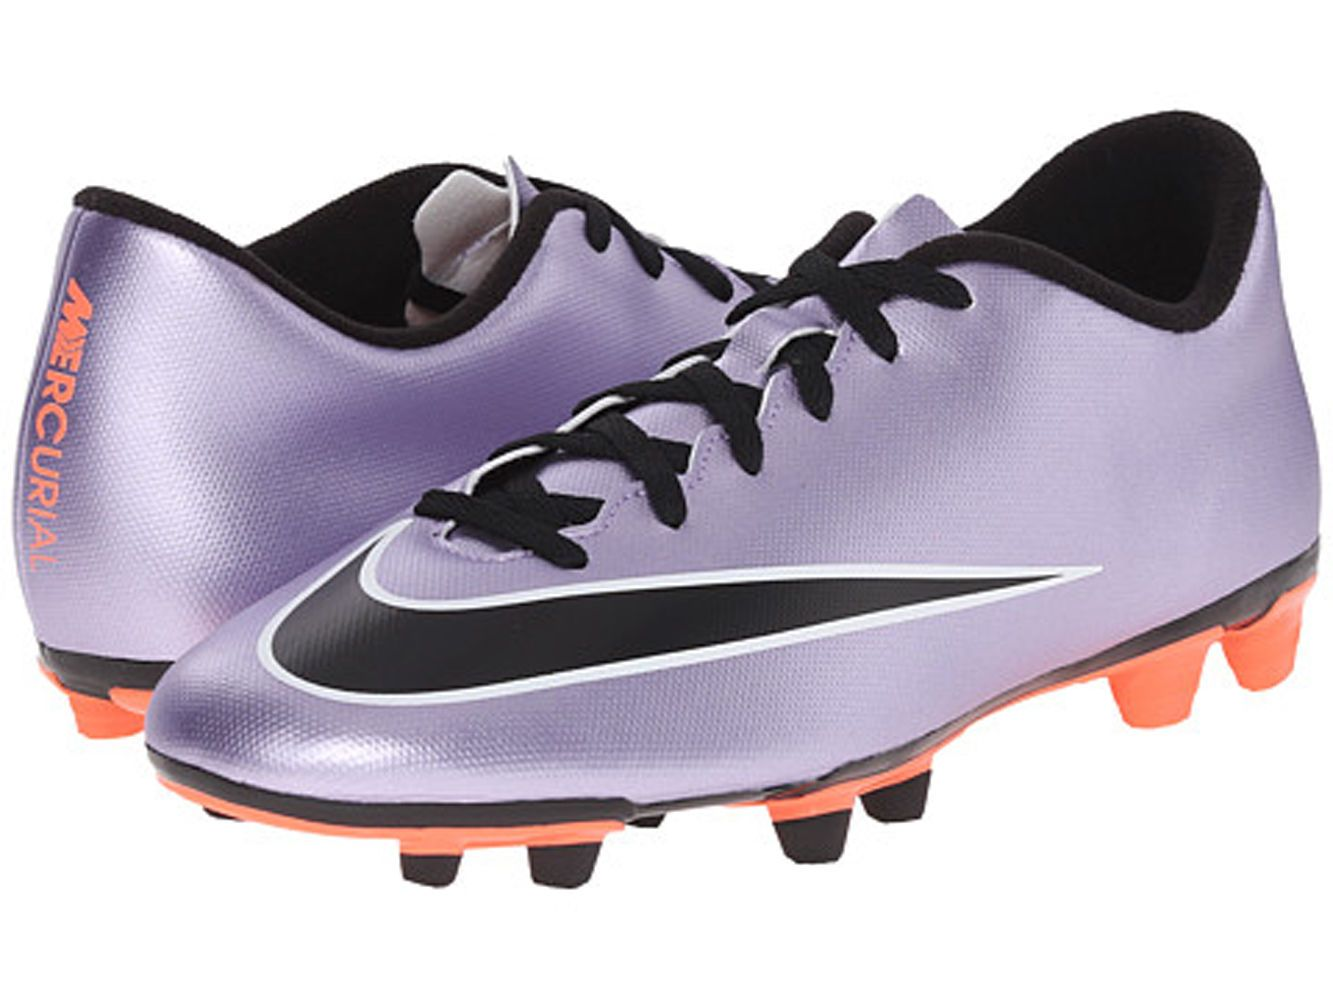 Nike Jr Mercurial Vortex II FG Youth Soccer Cleats Shoes Metallic Purple Sz  2.5 (eBay Link) 198a06e7e27